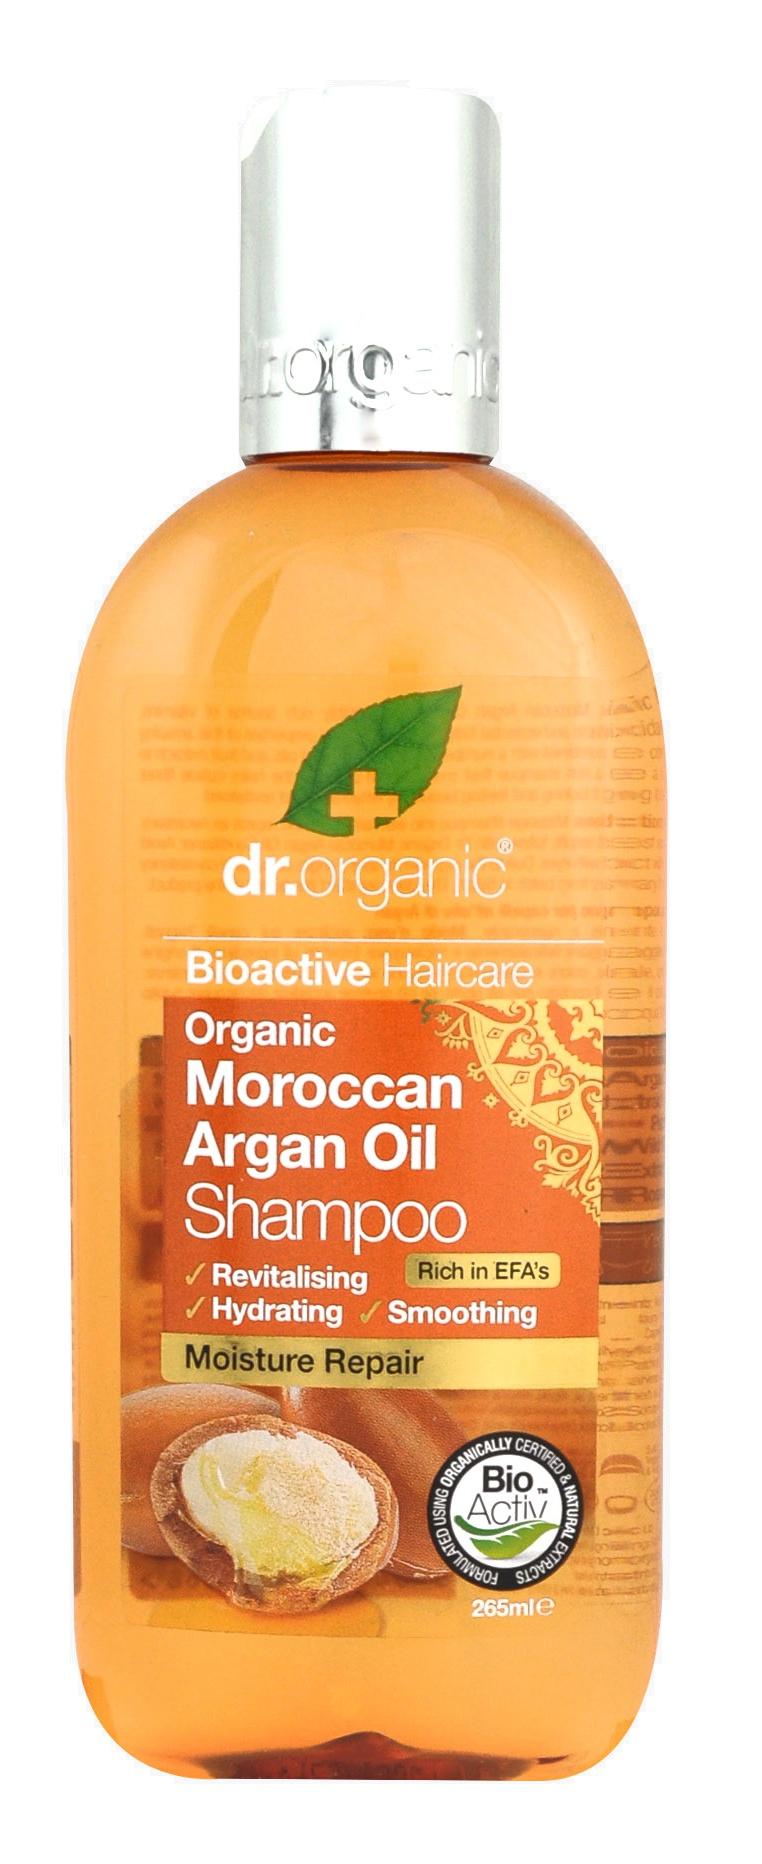 Dr Organic Moroccan Argan Oil Shampoo